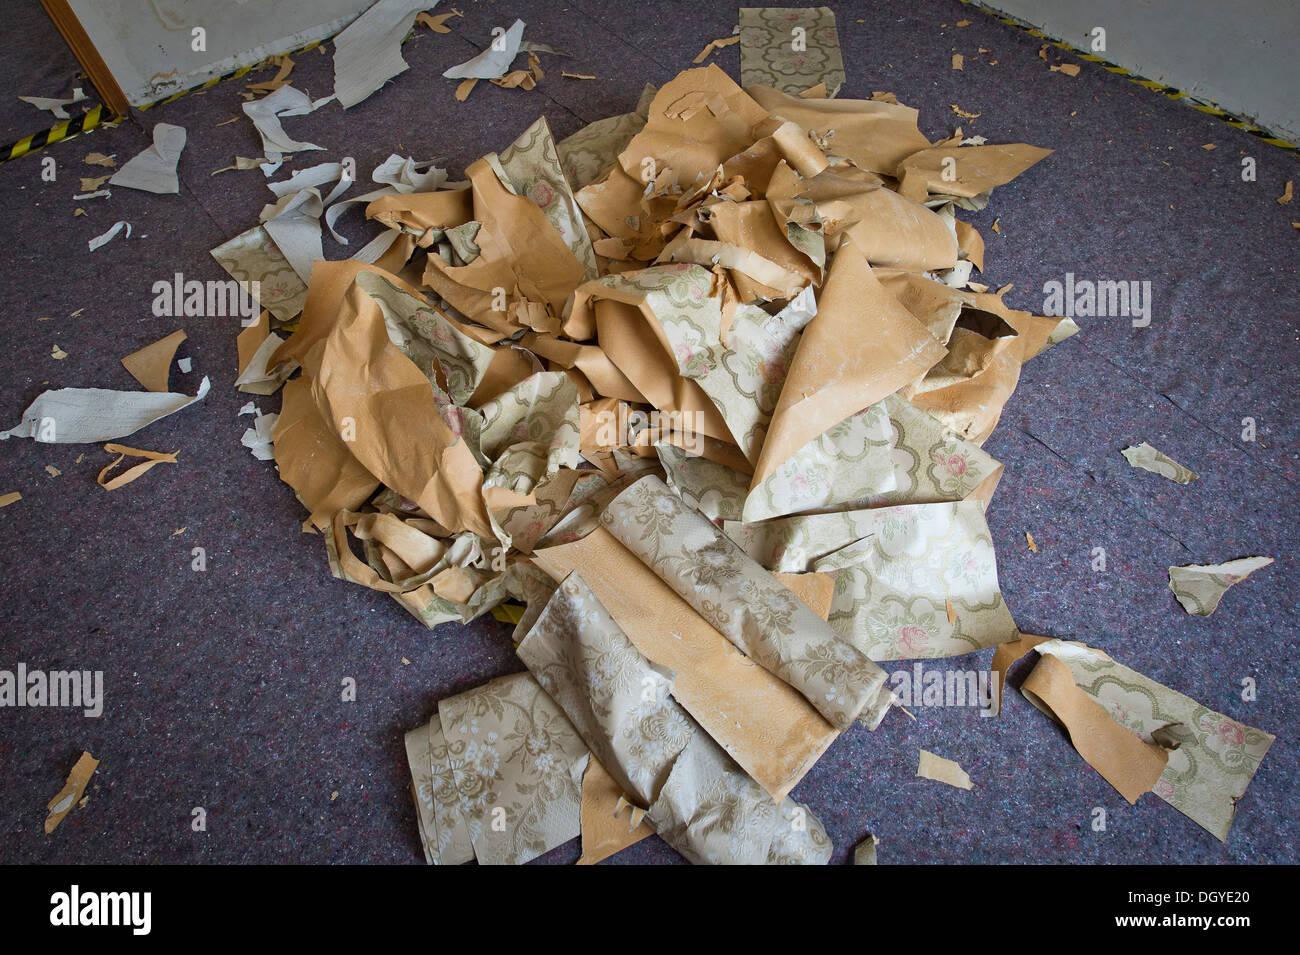 Heap of removed wallpaper scraps from the sixties, Stuttgart, Baden-Wuerttemberg - Stock Image